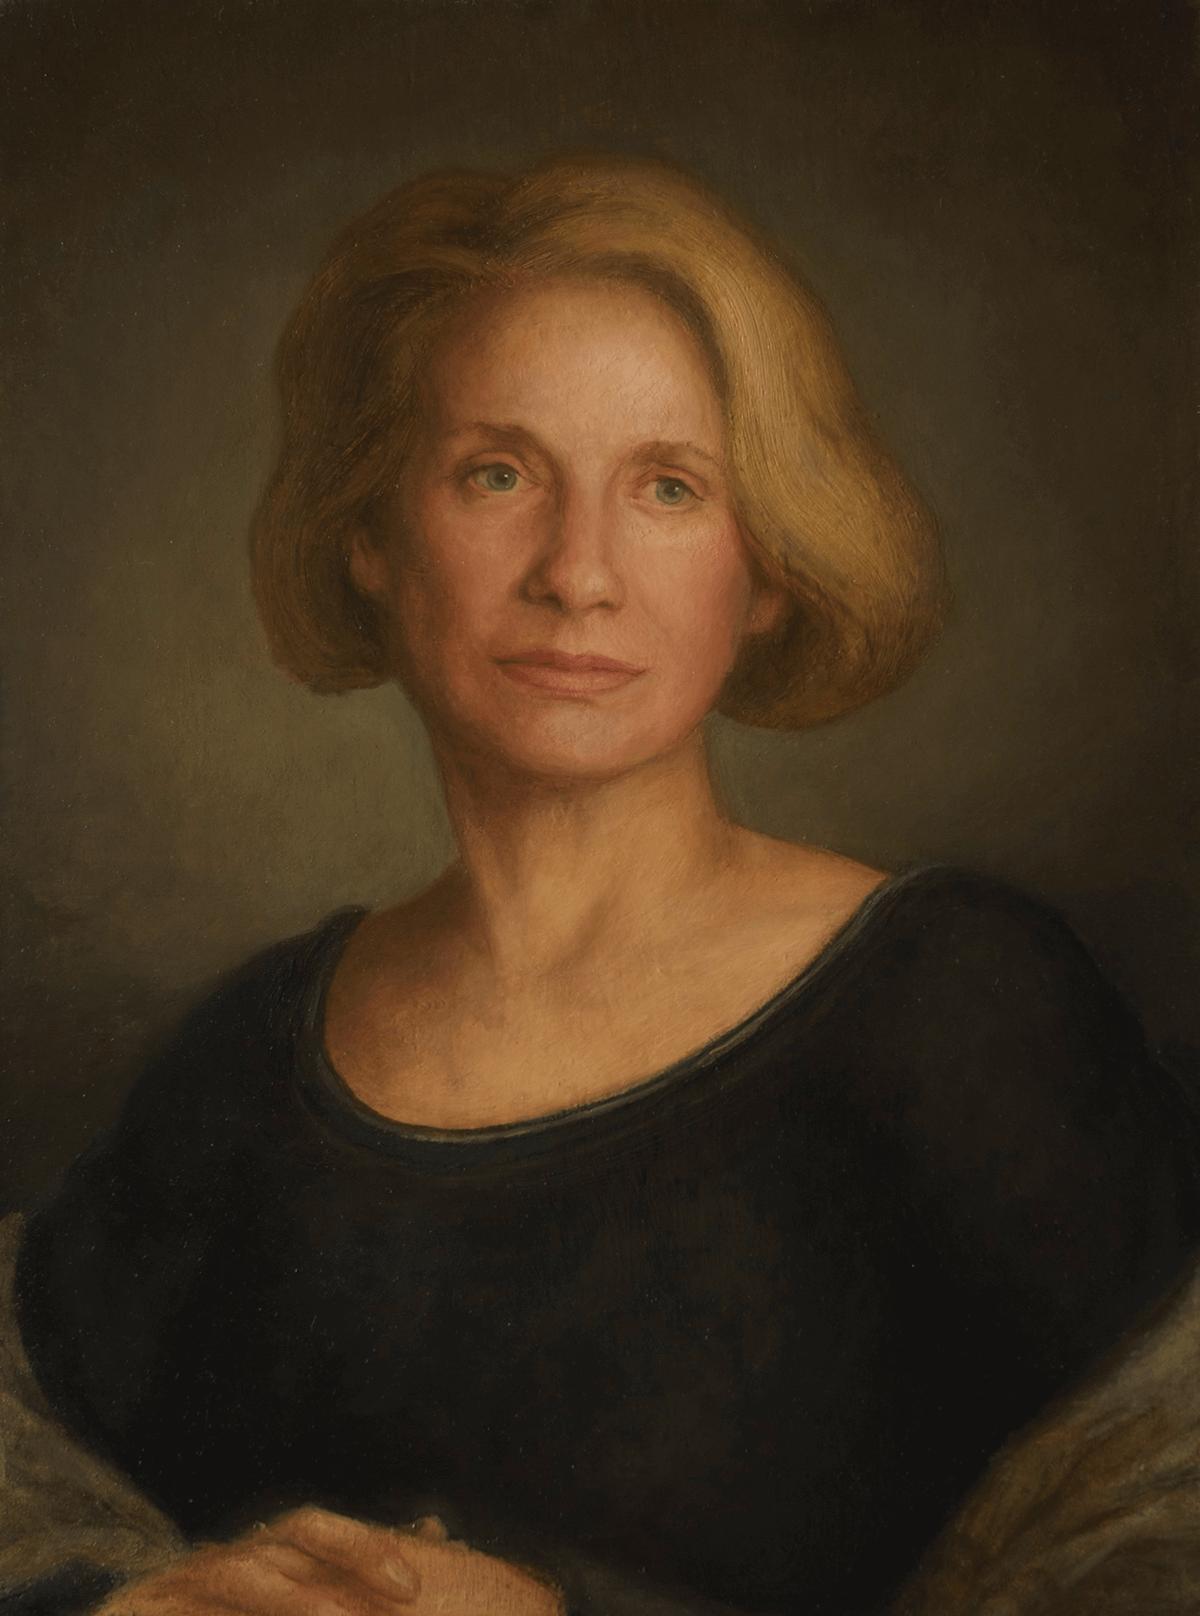 Studio Jonathan Sherman_portrait commission GK_web.png